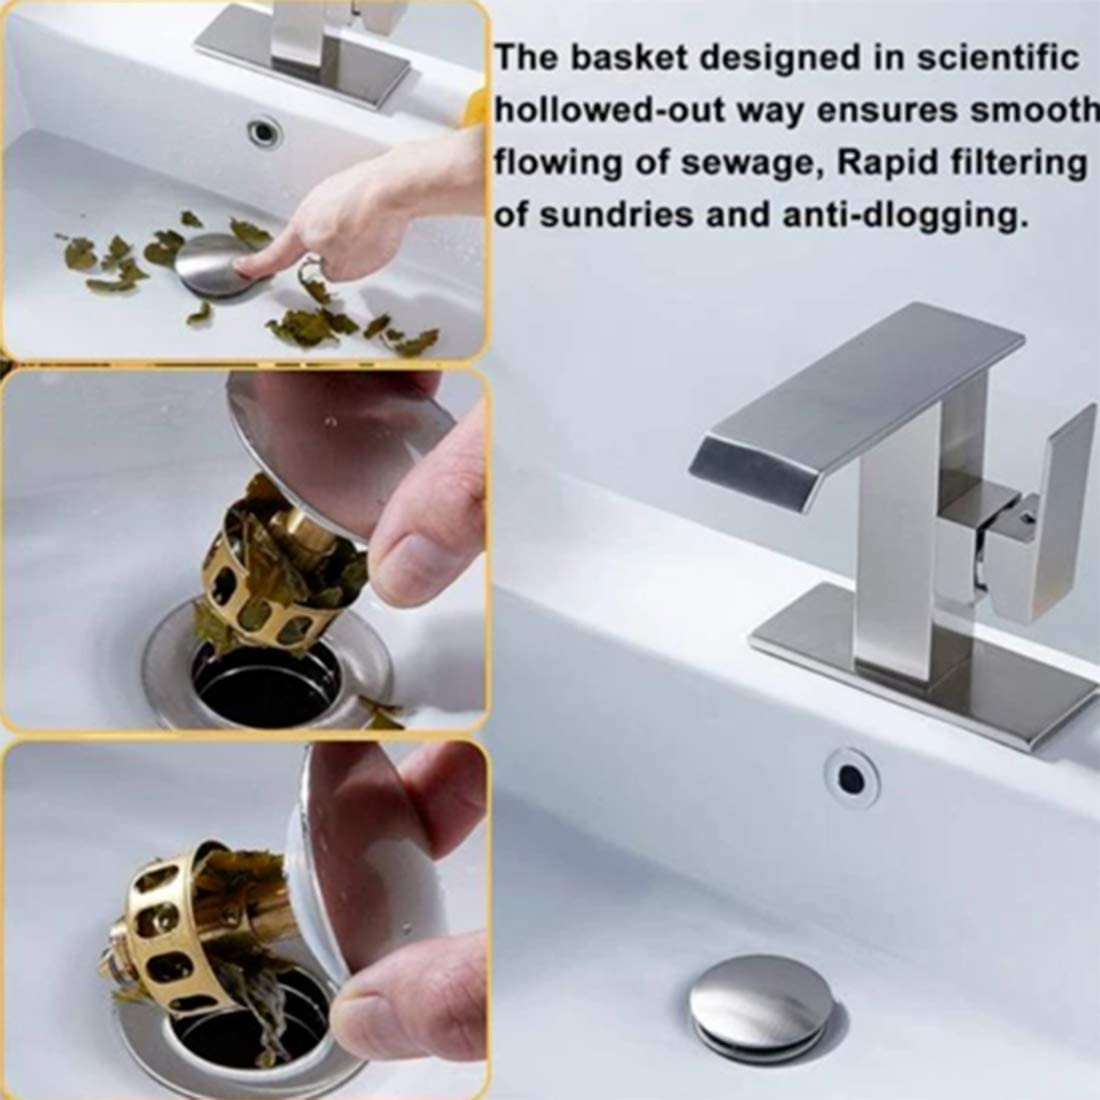 Universal wash basin bounce drain filter,Pop Up Bathroom Sink Drain Plug With Basket,Universal Size Sink Drain Stopper 1pcs